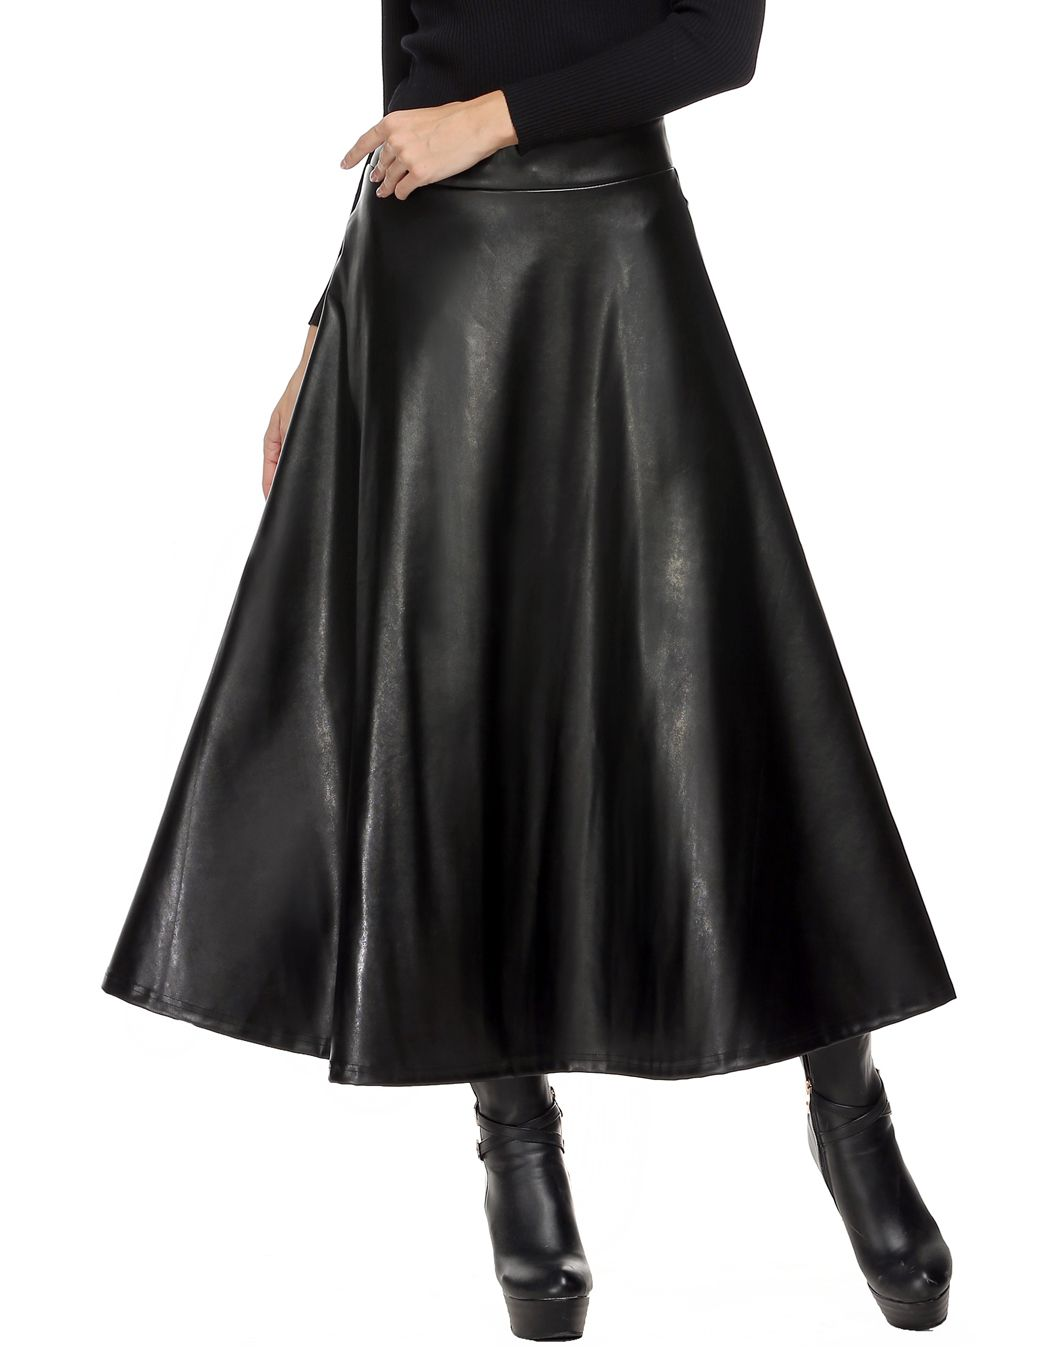 Lange röcke frauen sommer hight taille maxi rock pu leder schlank frühjahr herbst vintage mode plissiert swing rock schwarz